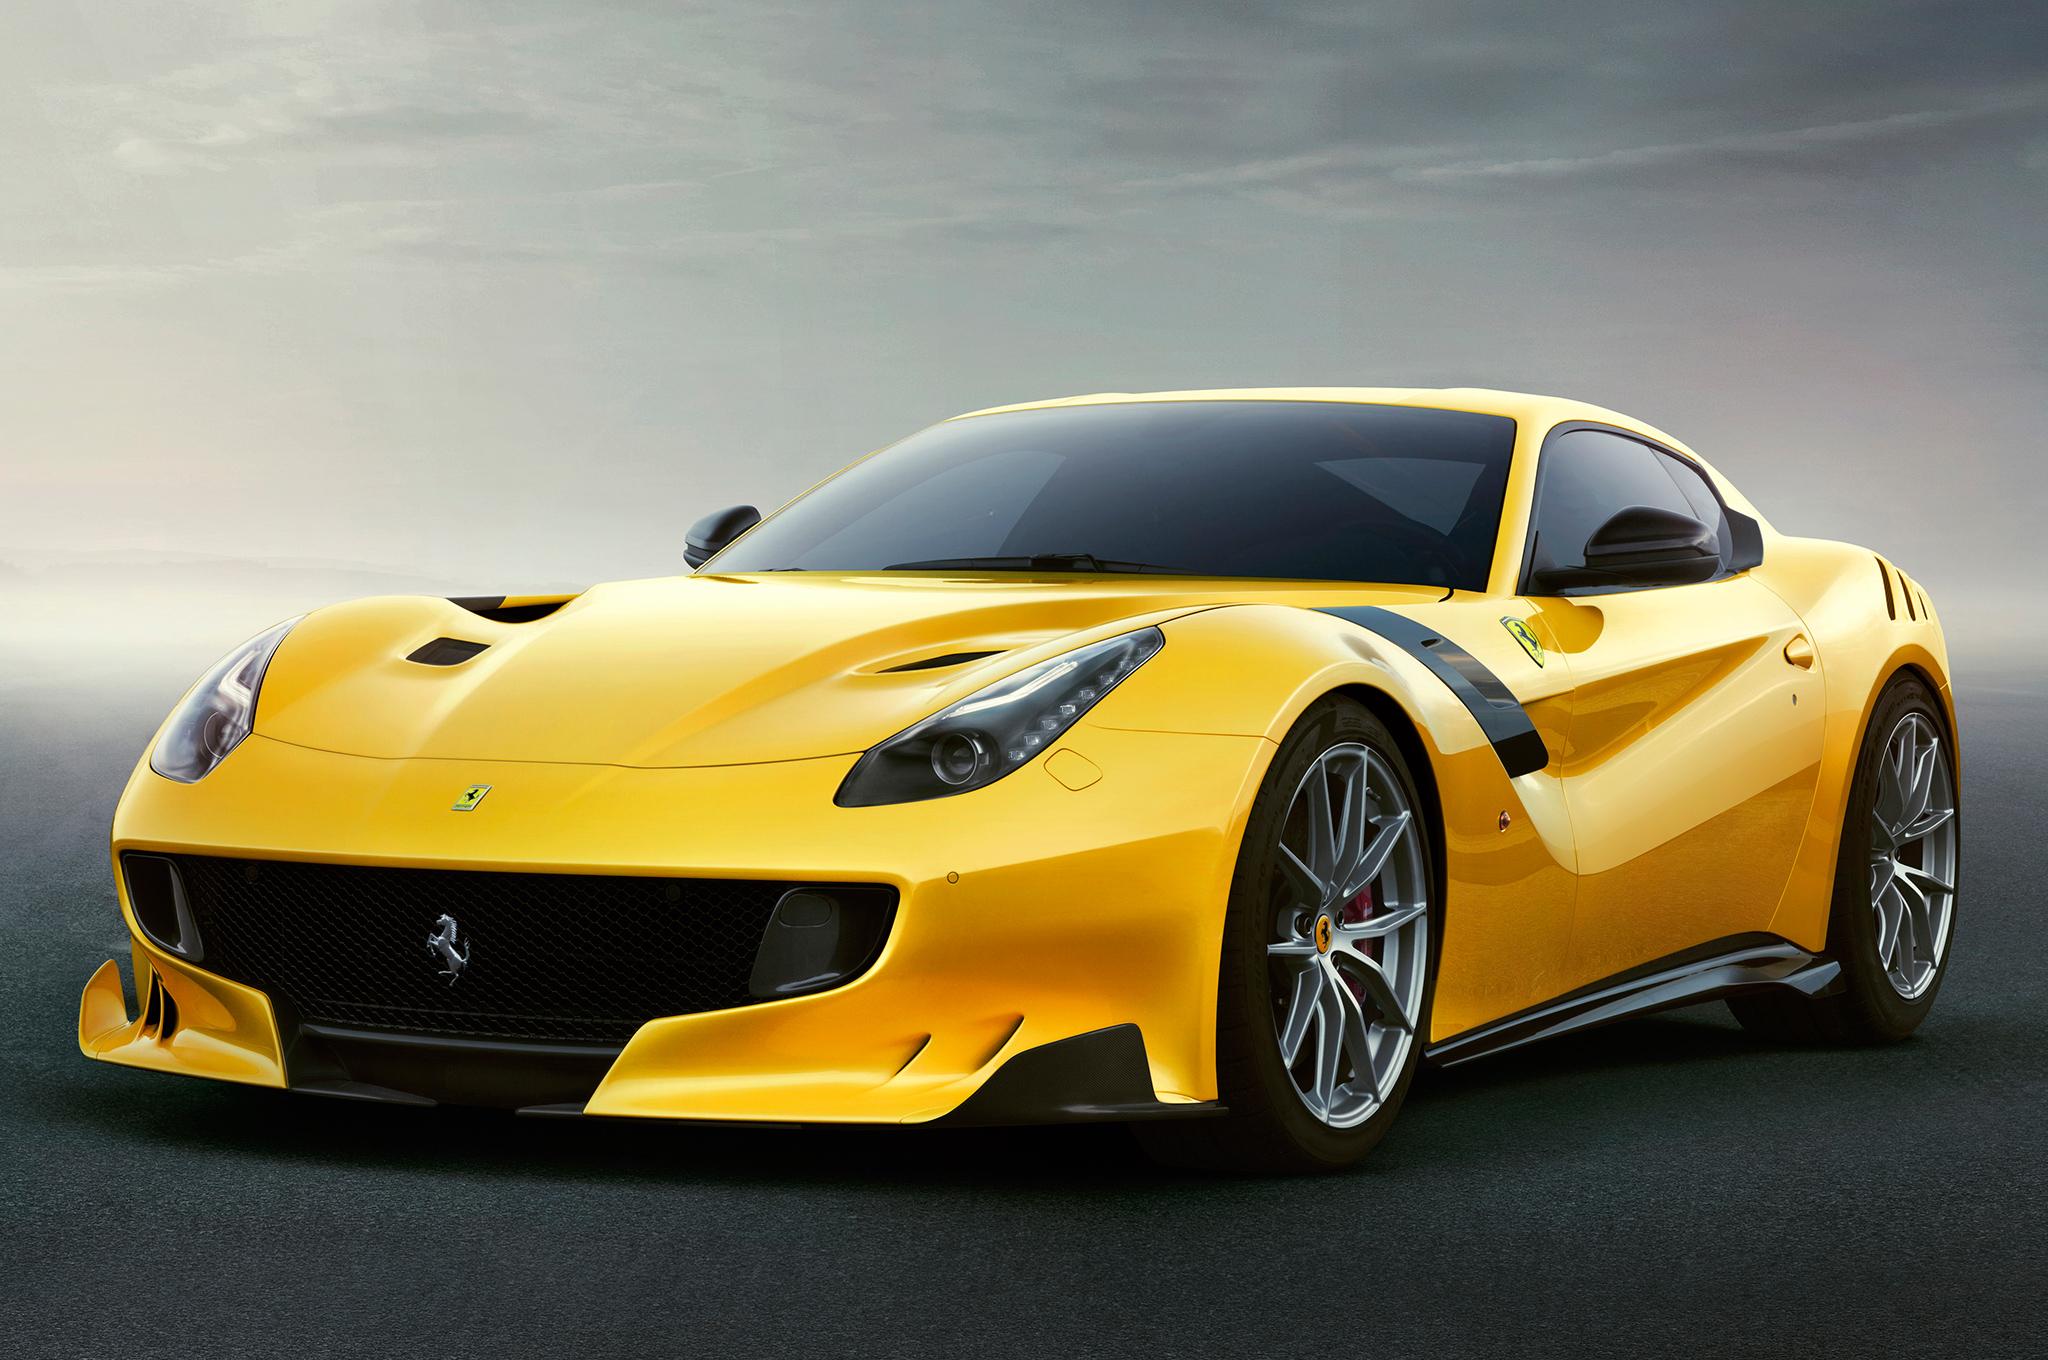 770 Hp Ferrari F12 Tdf Revealed